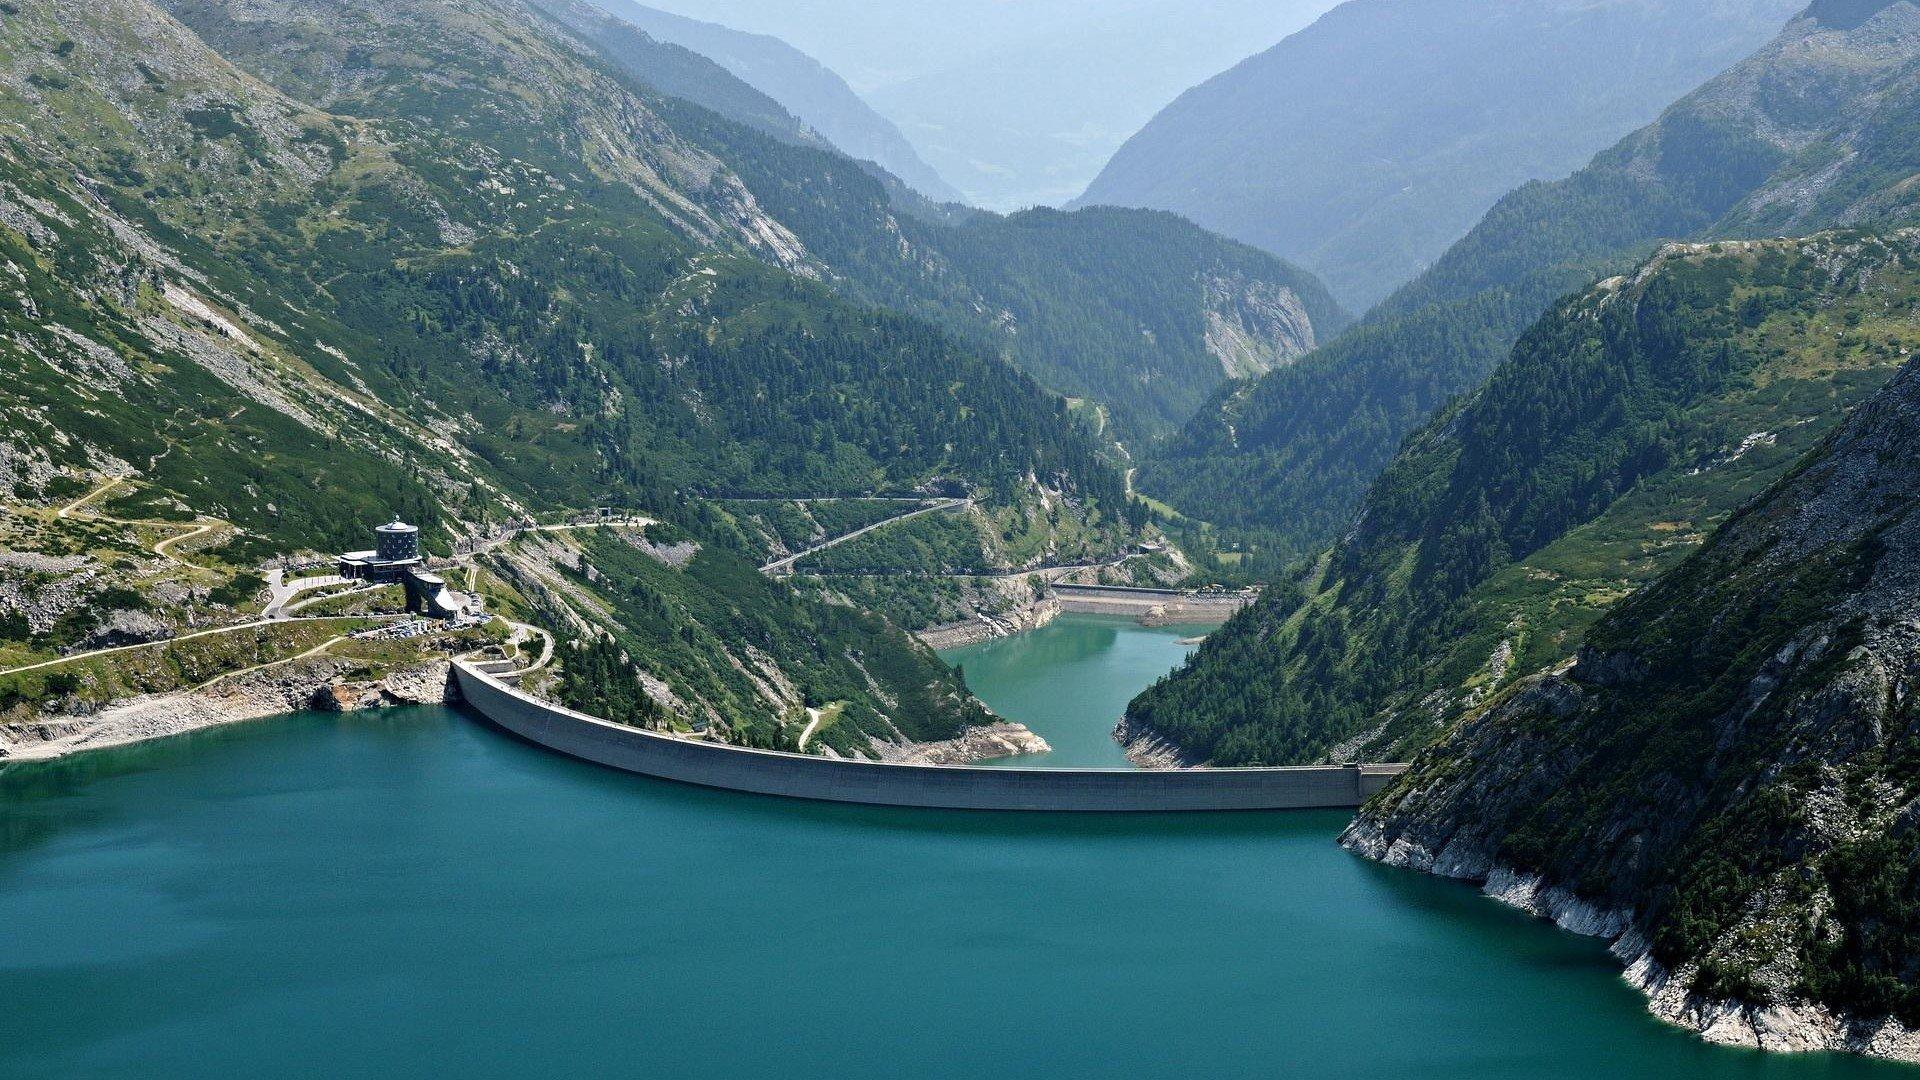 Carinthia Dam Austria HD wallpaper 1920x1080